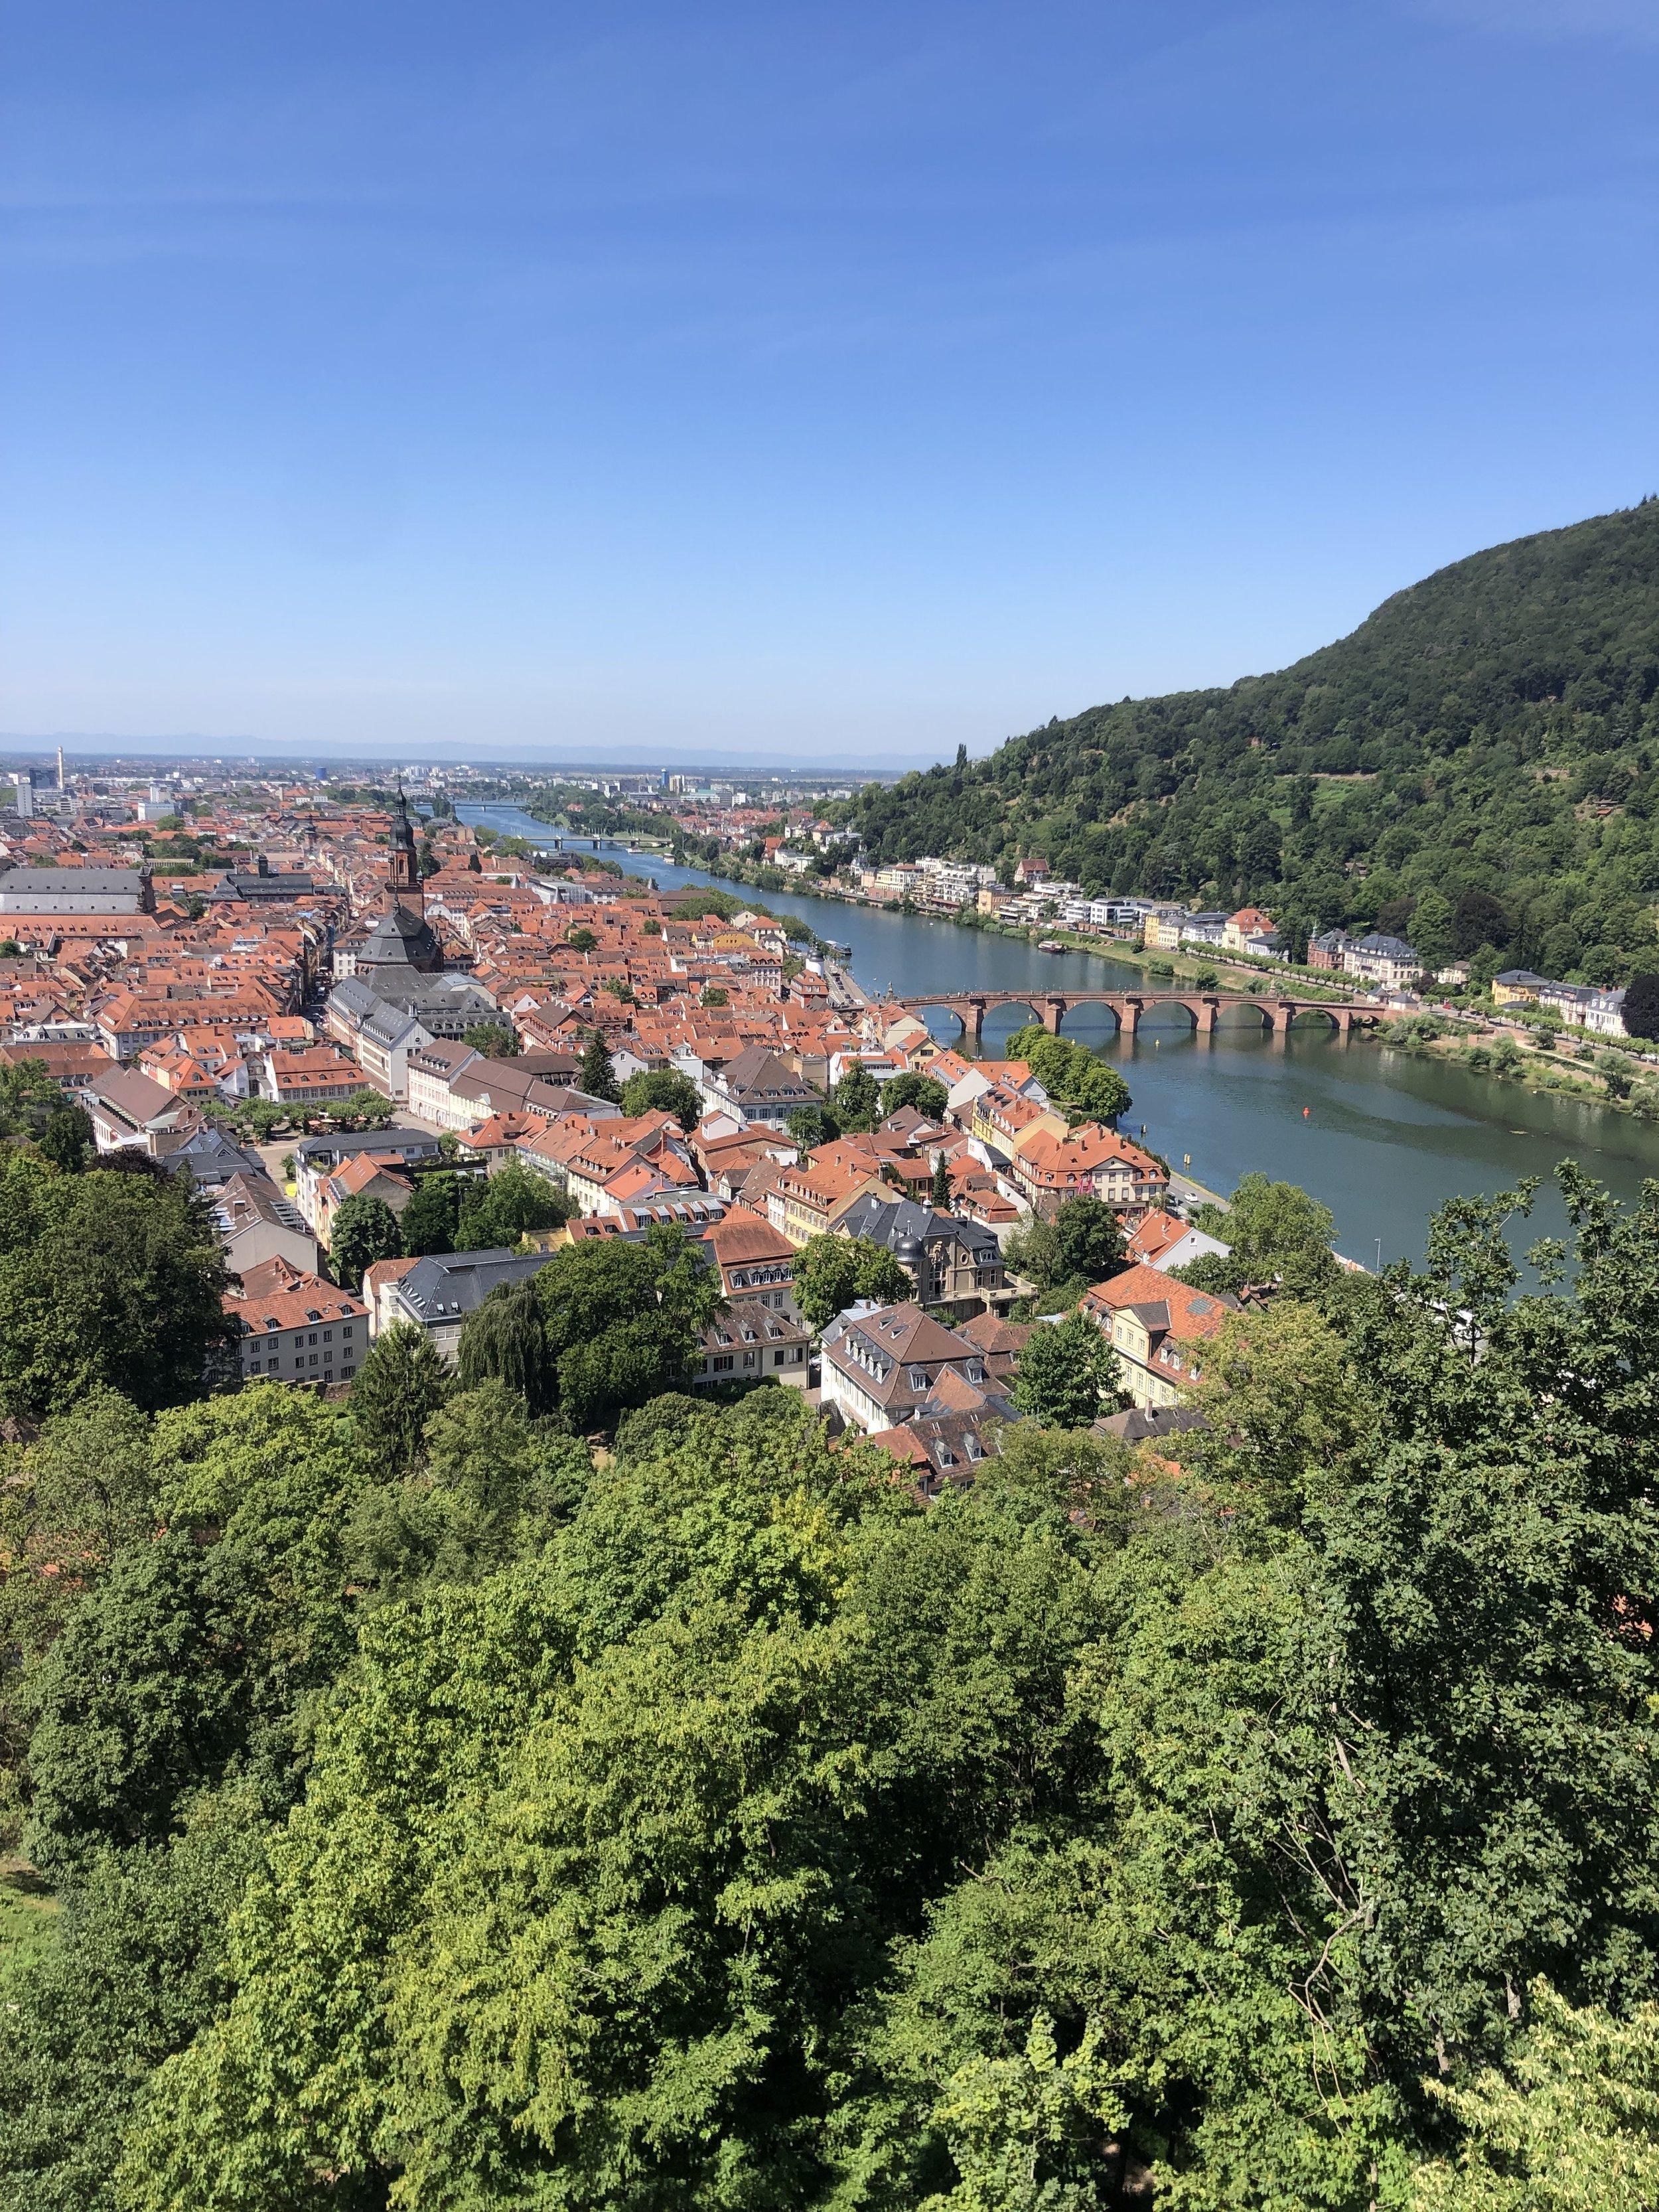 Heidelberg as seen from a trail near the castle.